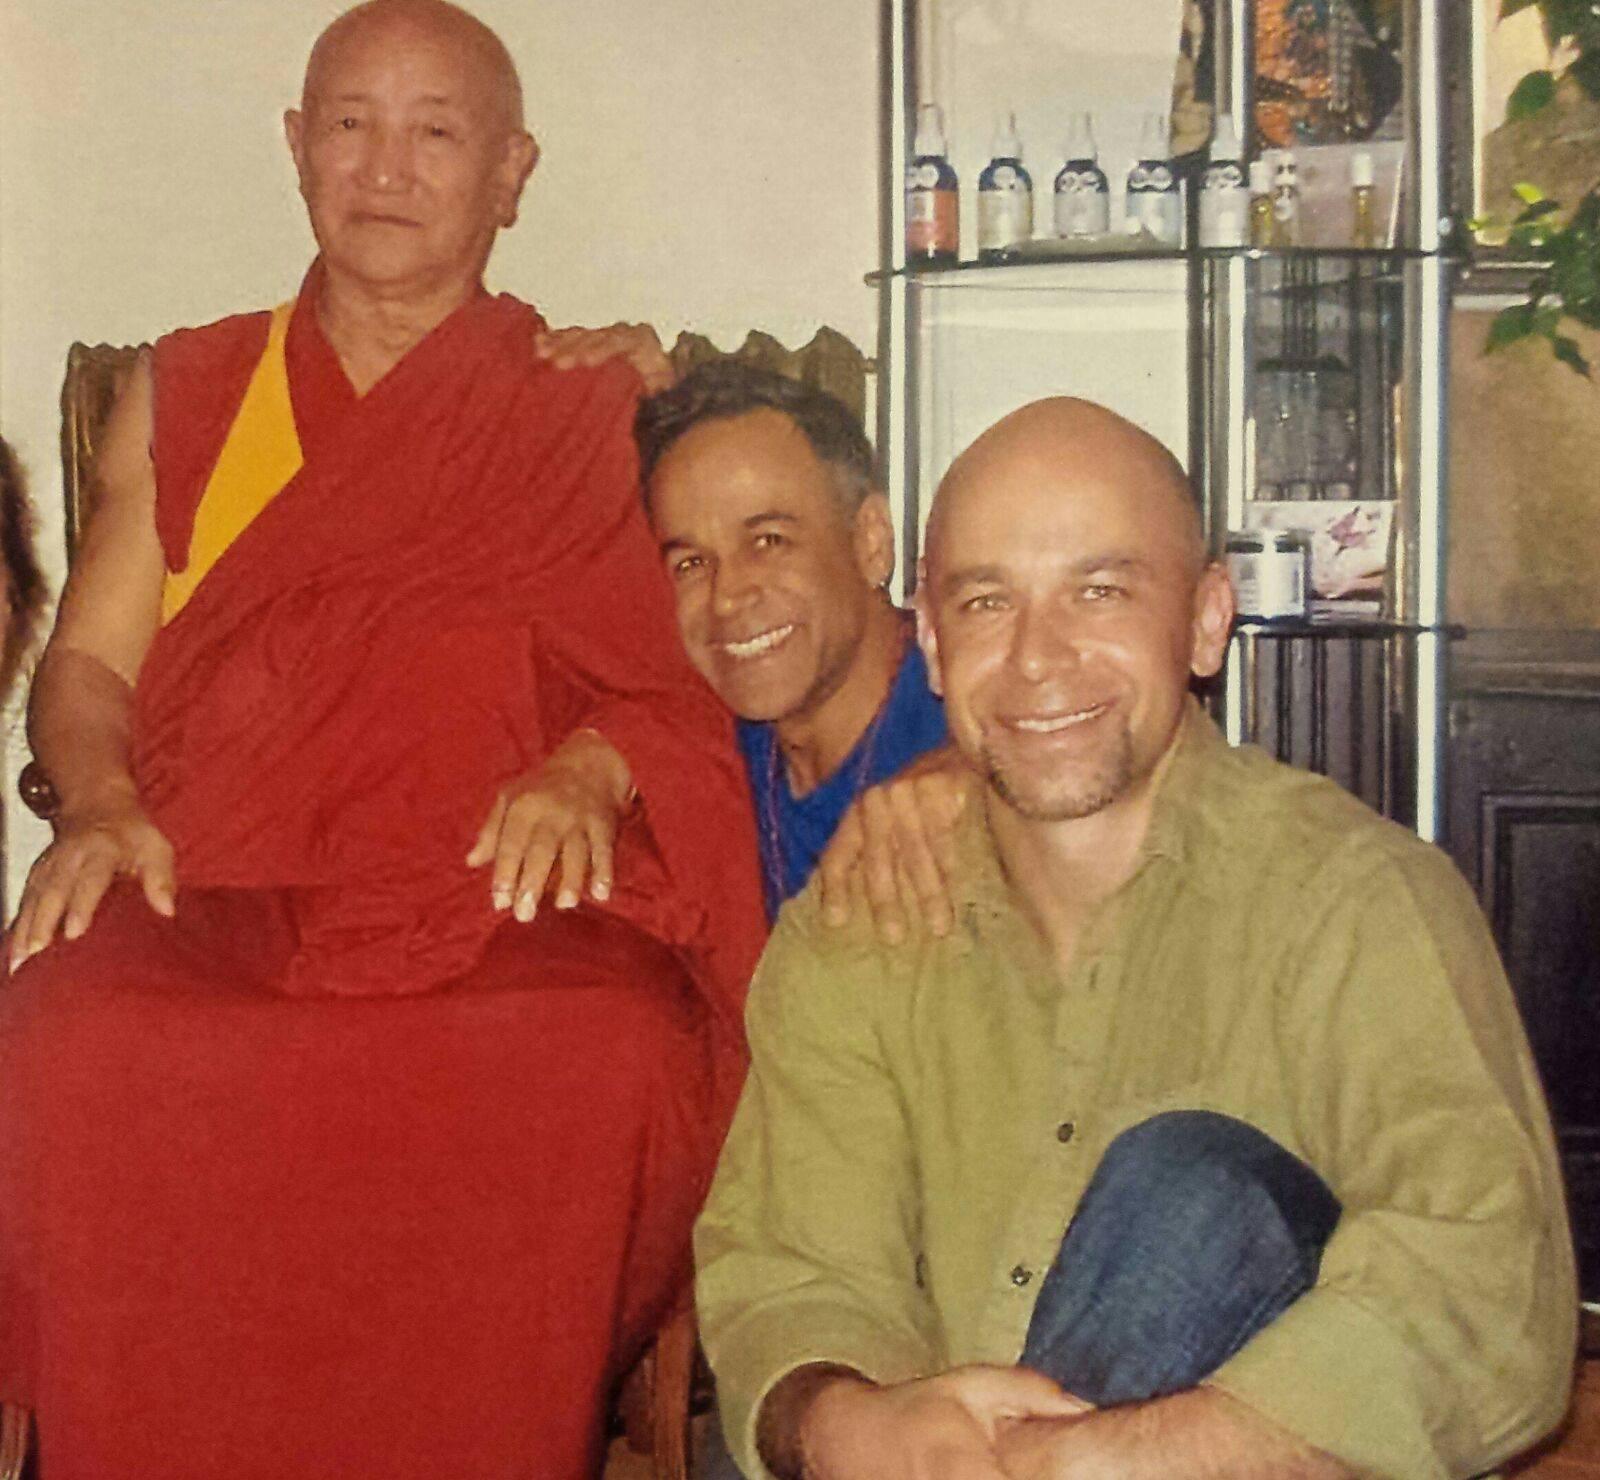 Lama Gyumed Khensur Rinpoche  Lobsang Jampa  with  Vivekan (center) and Bodhisattva Yoga-trained teacher Bill, 2012